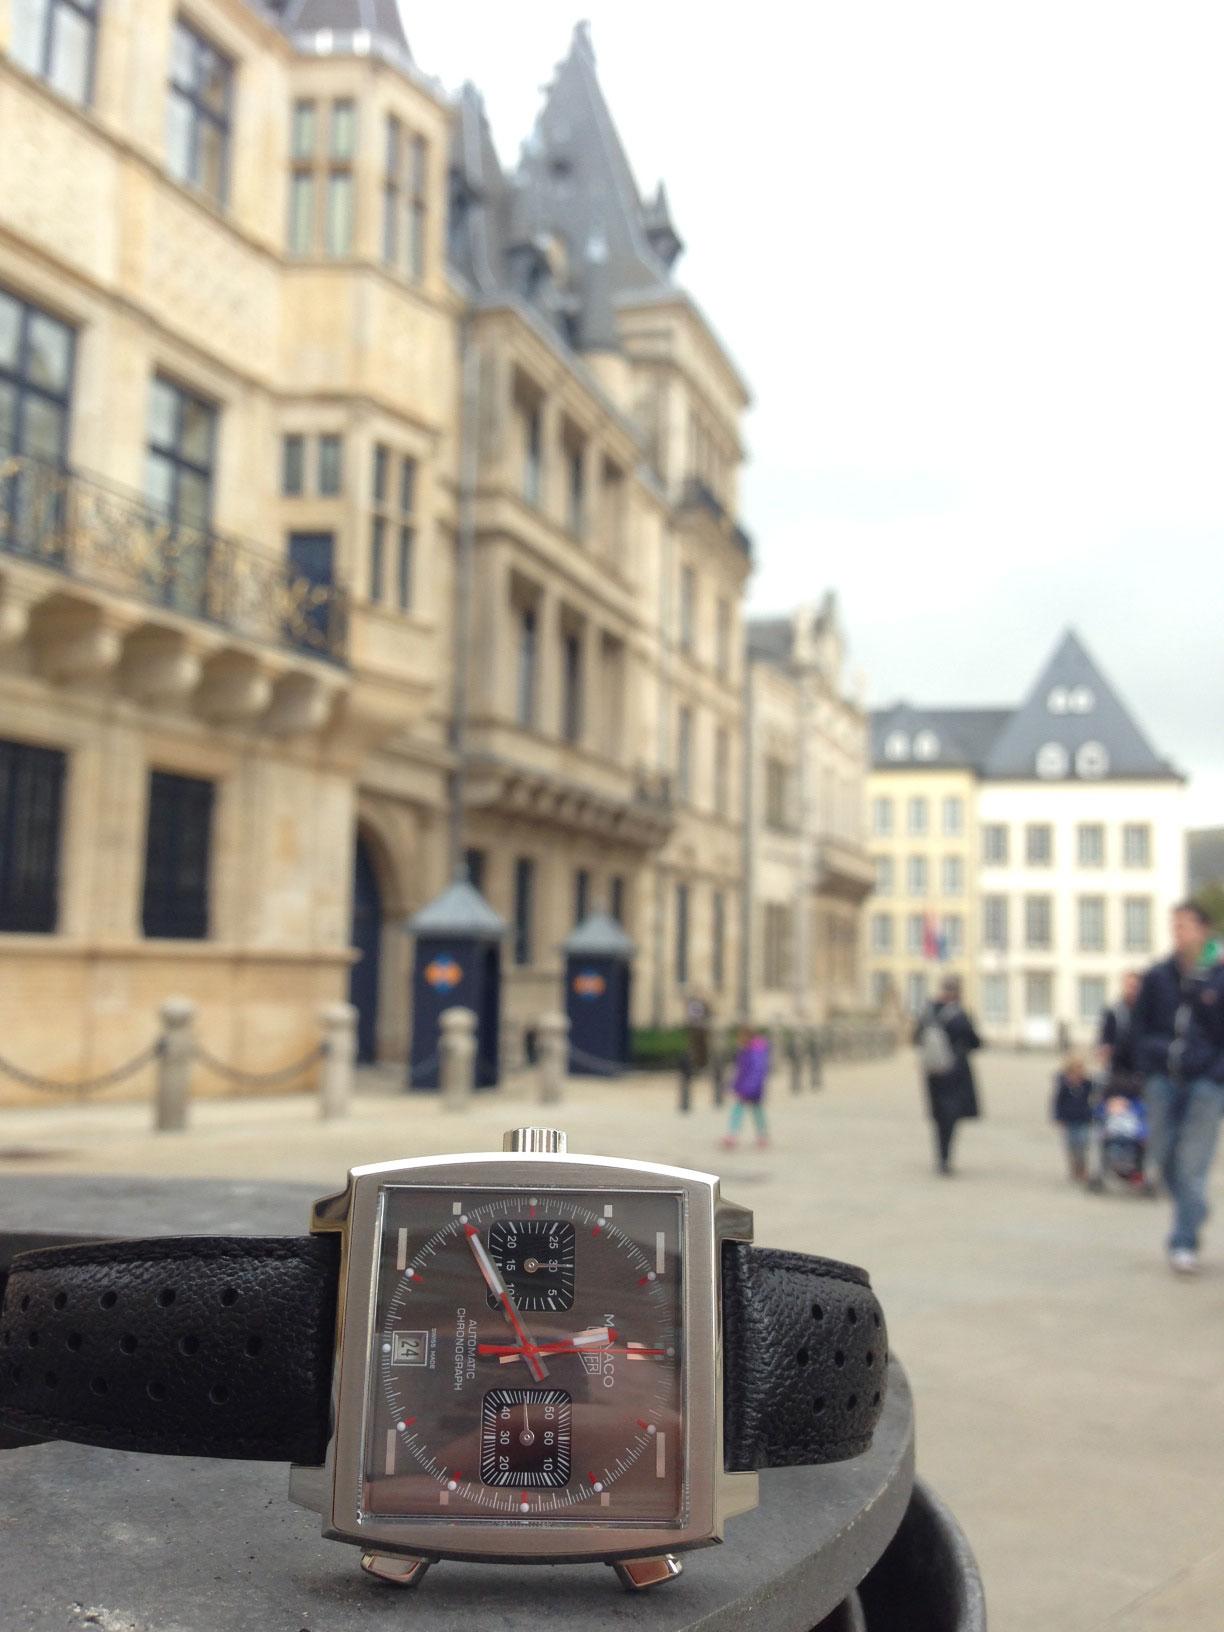 Monaco Tag heuer montre de luxe d'occasion cresus